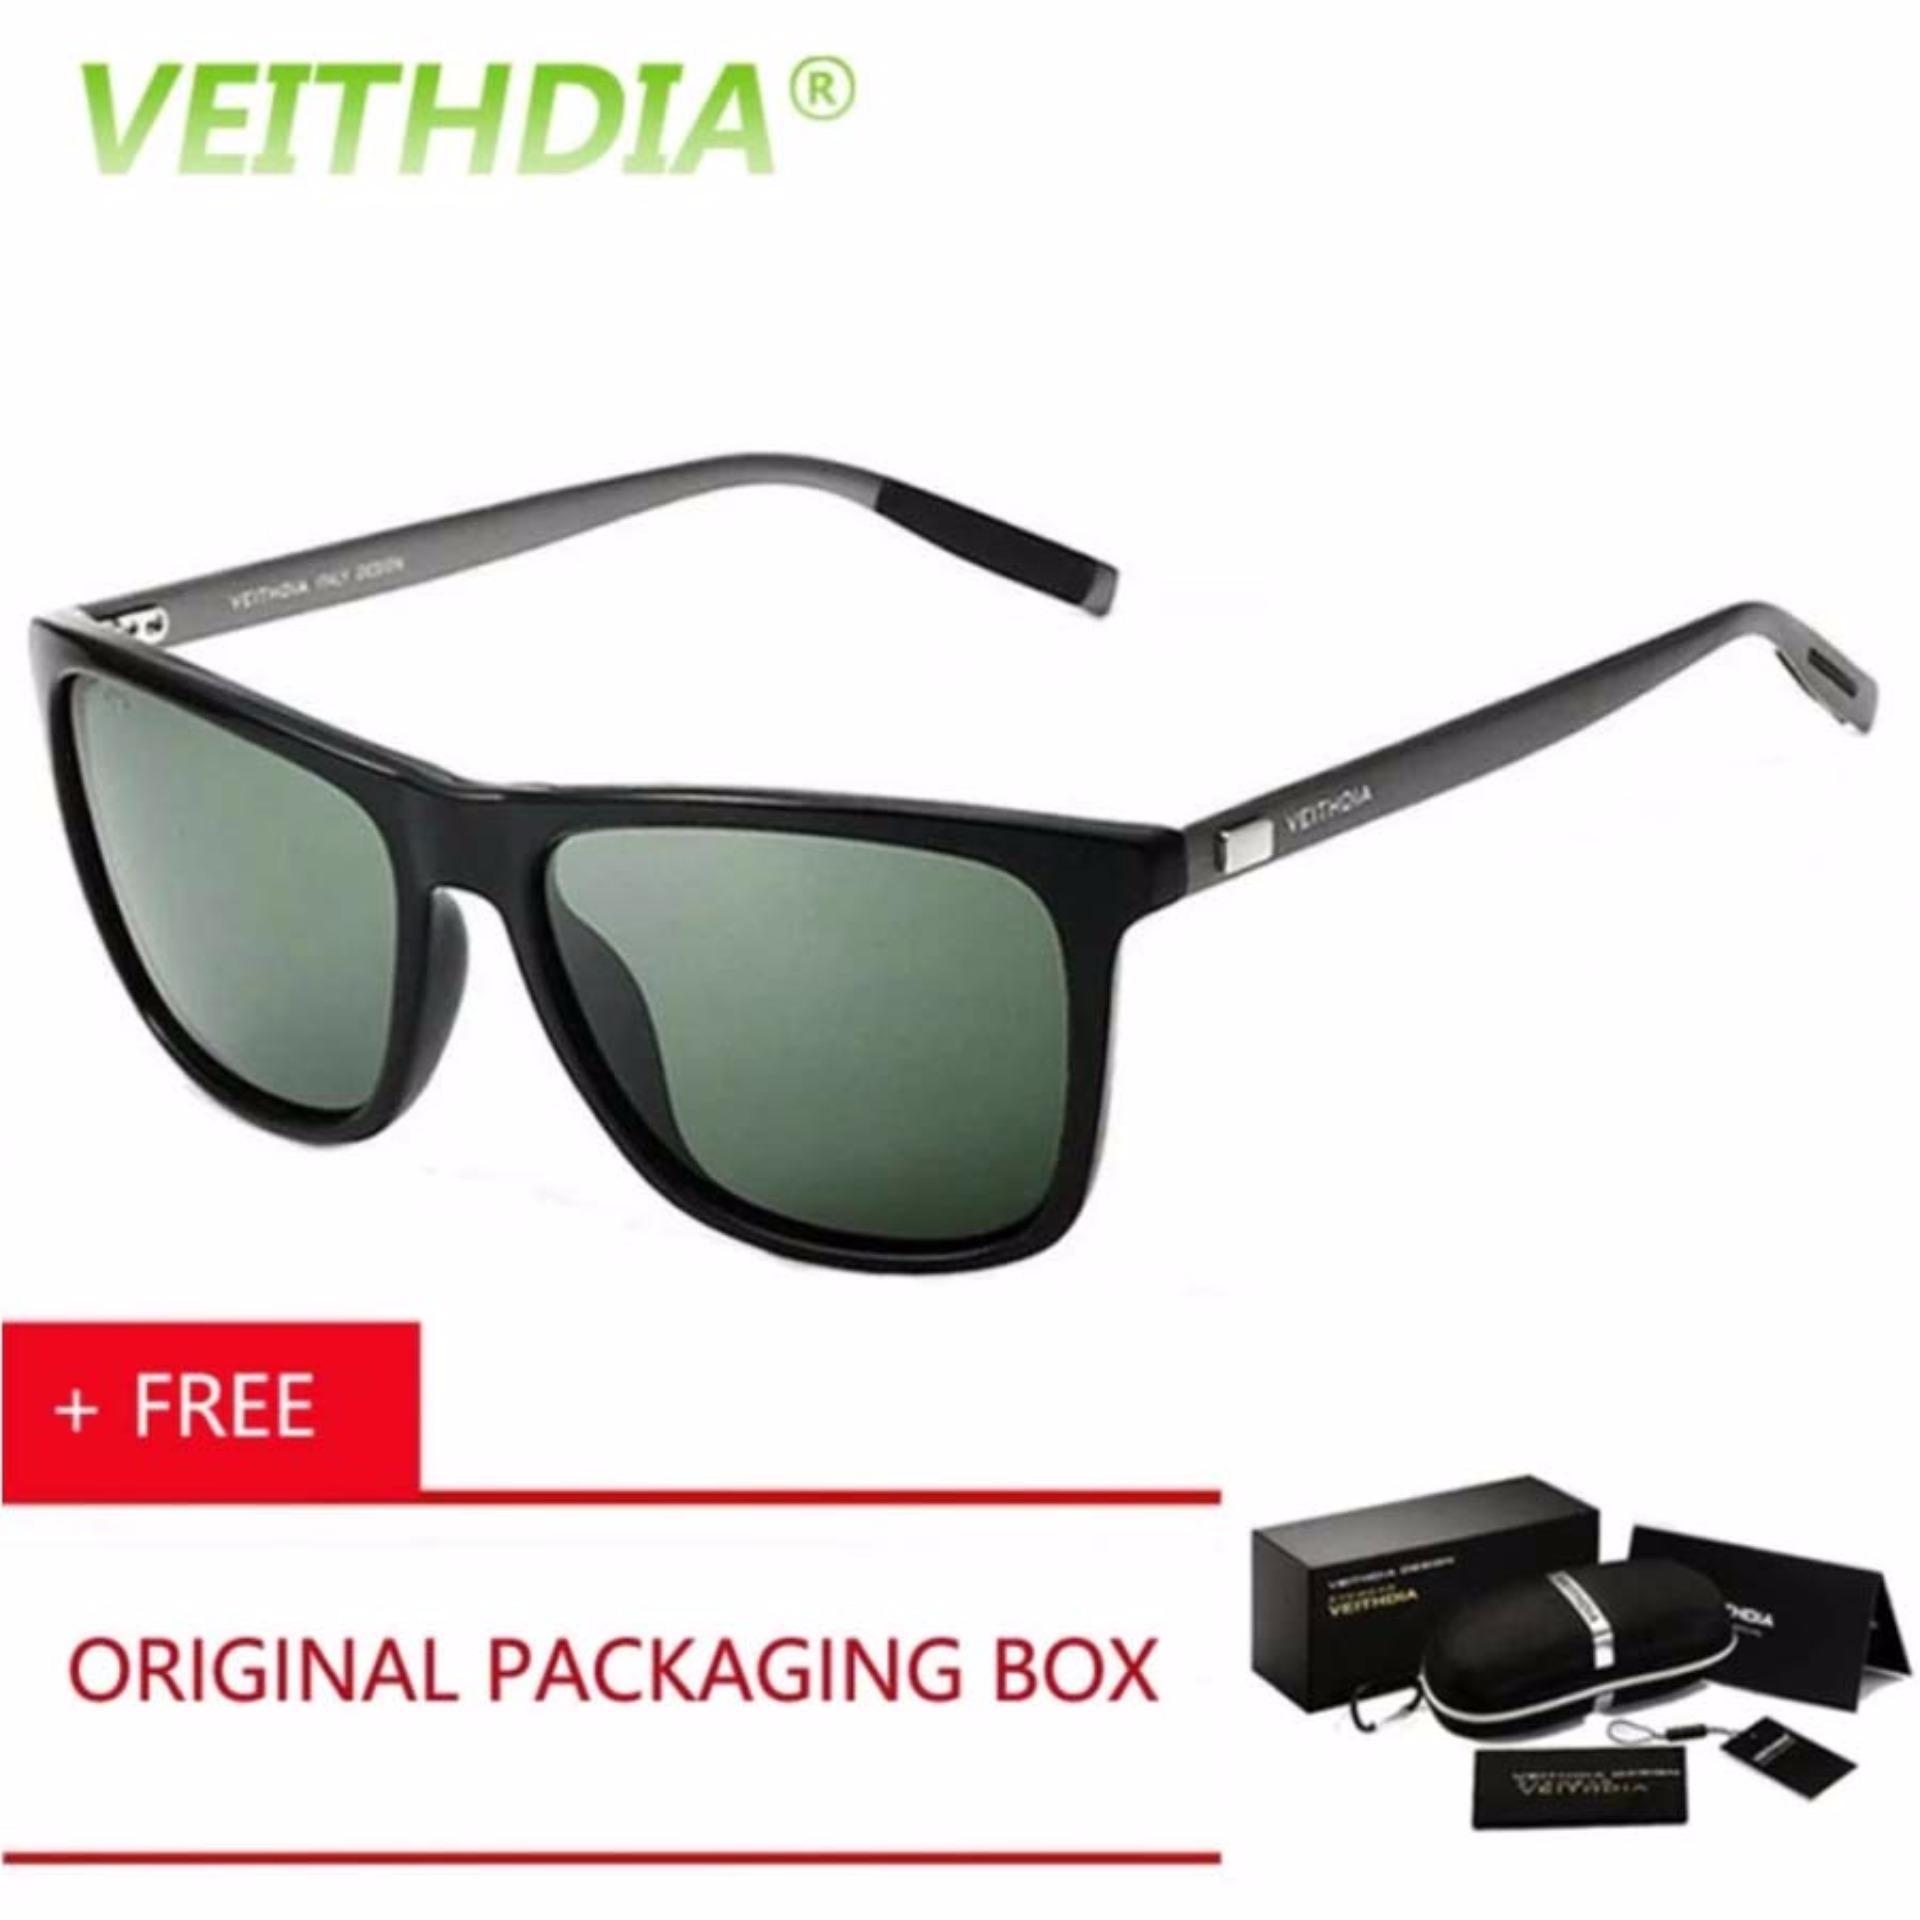 Beli Veithdia Kacamata Hitam Aluminium Sport Dan Travel Elegant Mirrored Uv400 Polarized Sunglasses 6108 Di Jawa Barat